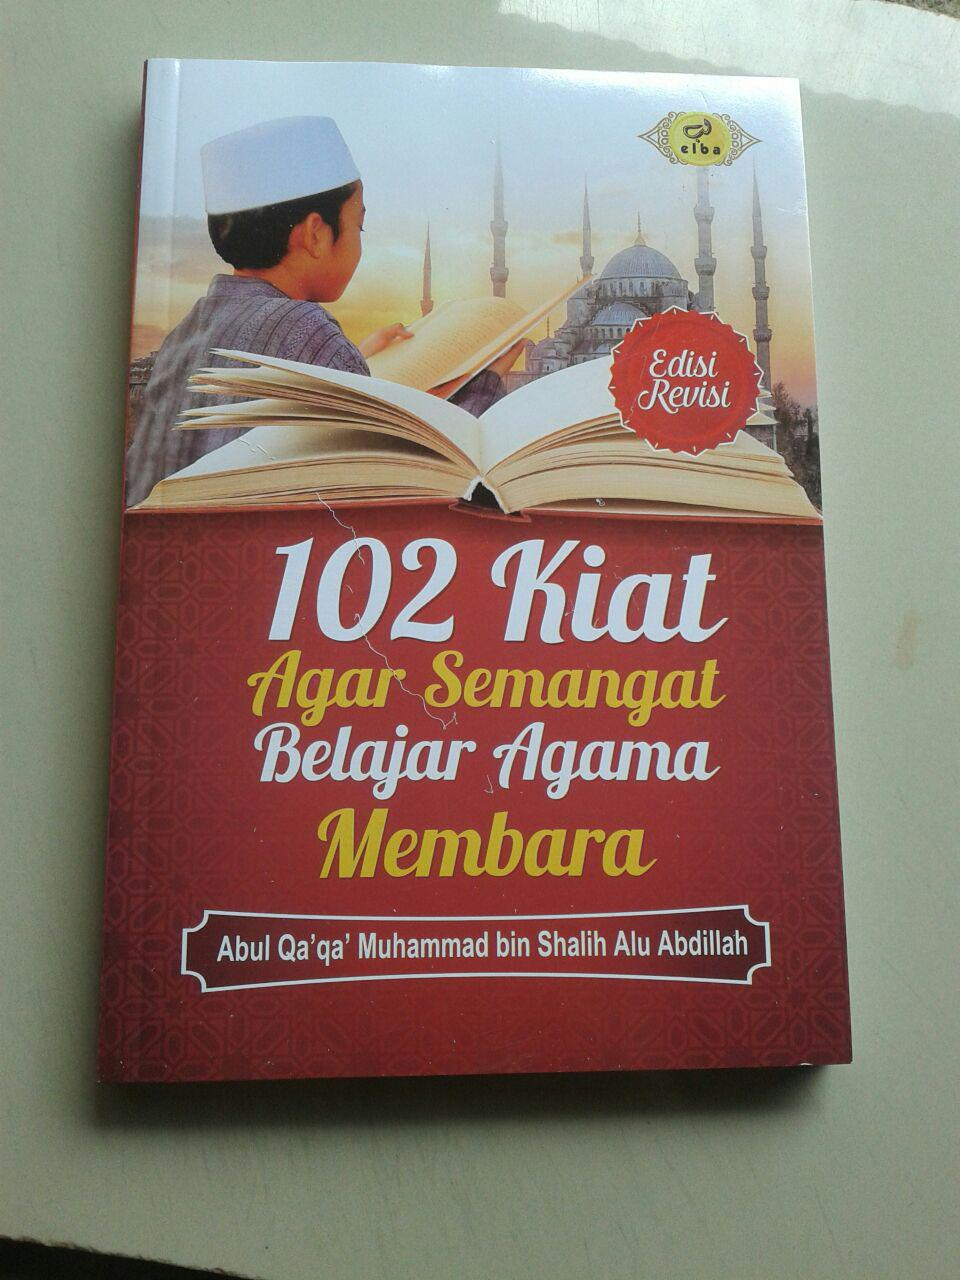 Buku 102 Kiat Agar Semangat Belajar Agama Membara cover 2